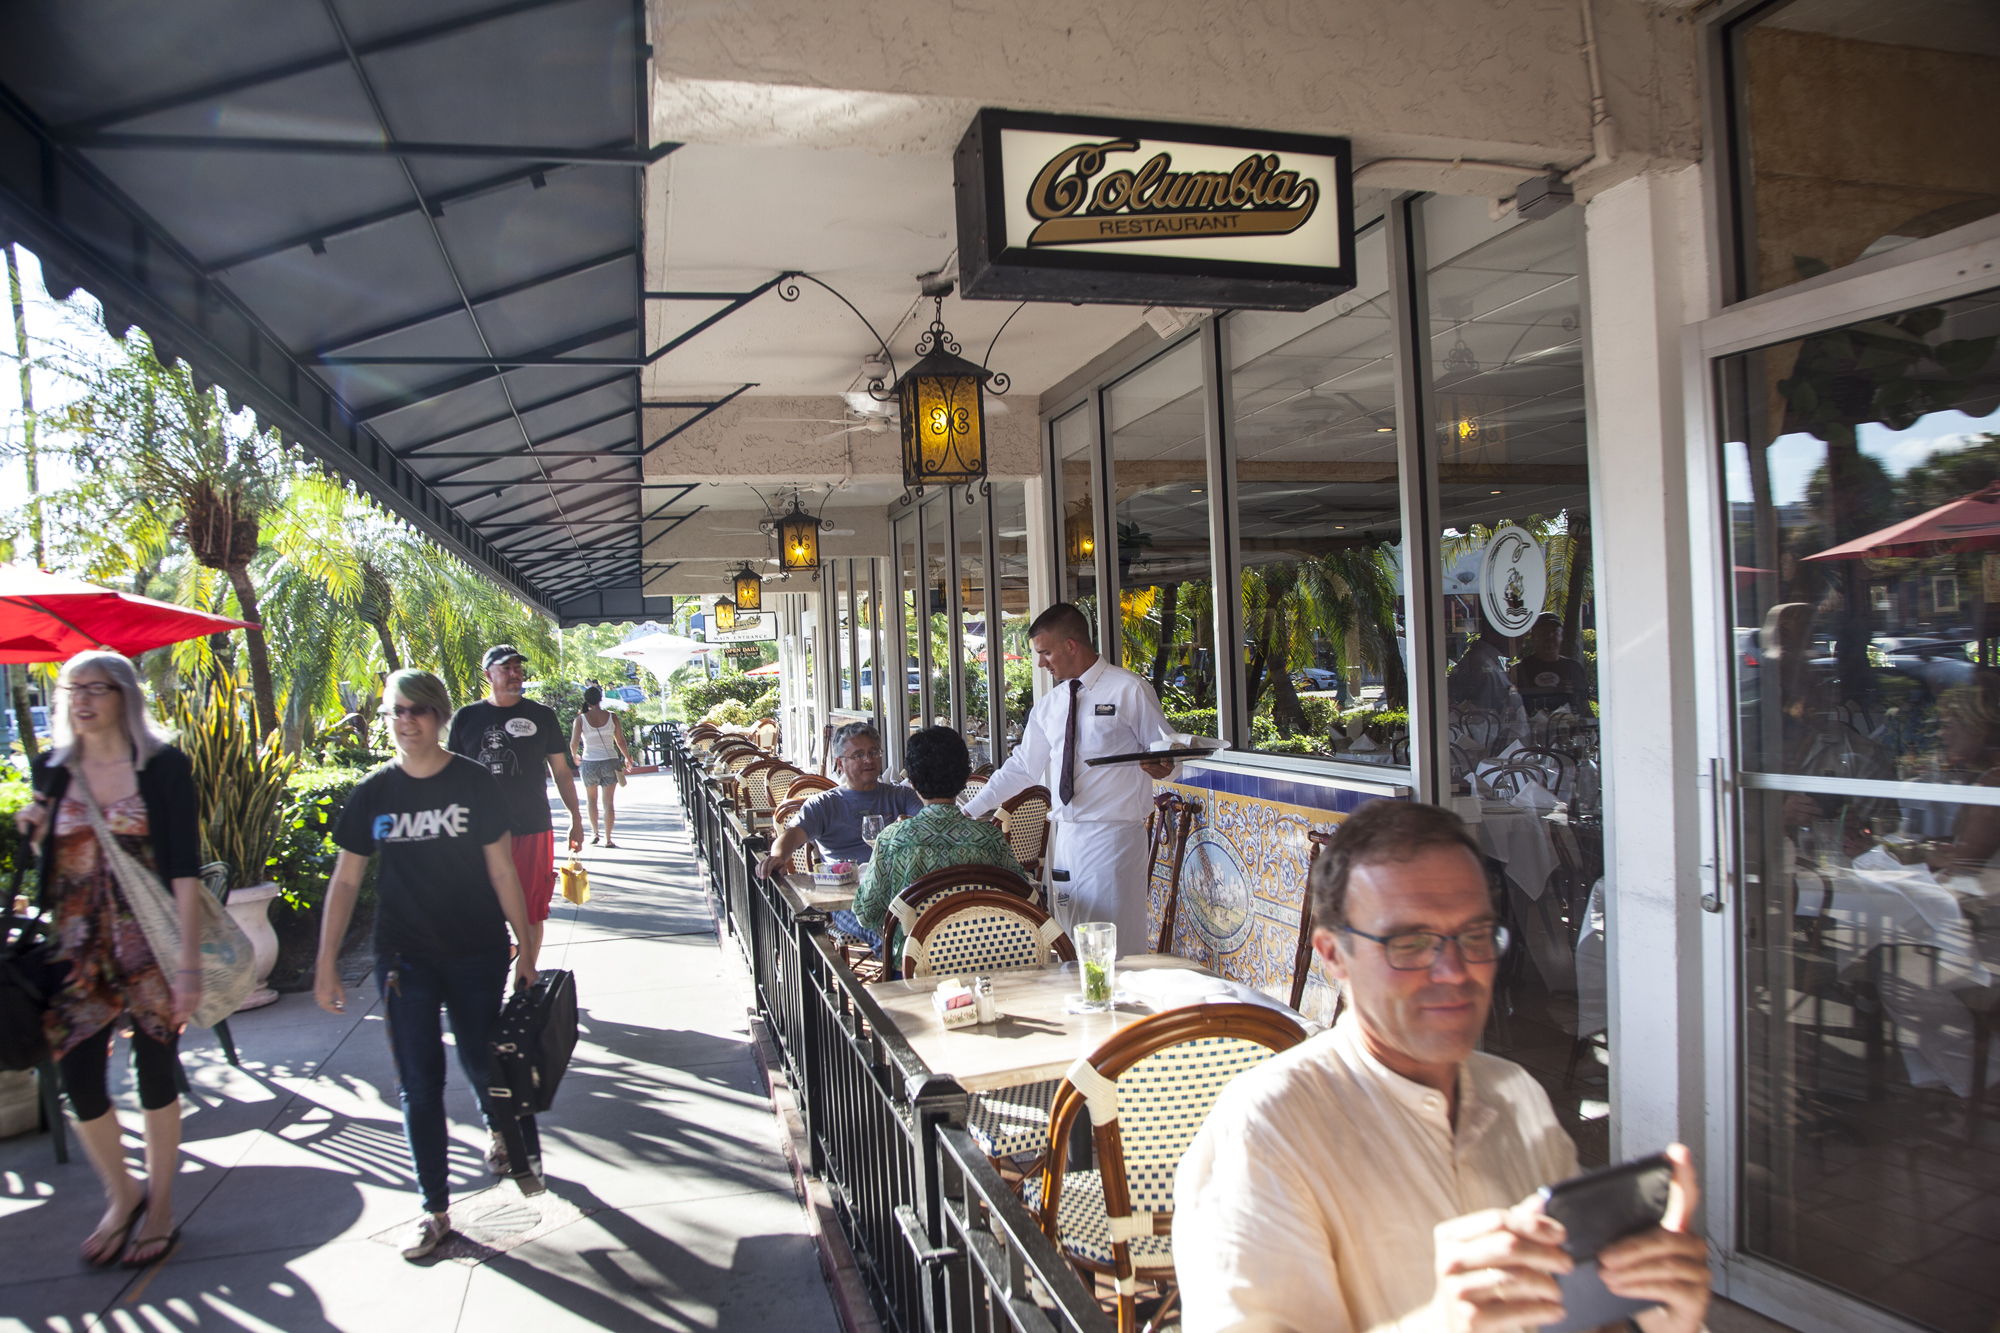 Columbia - famous Cuban restaurant.